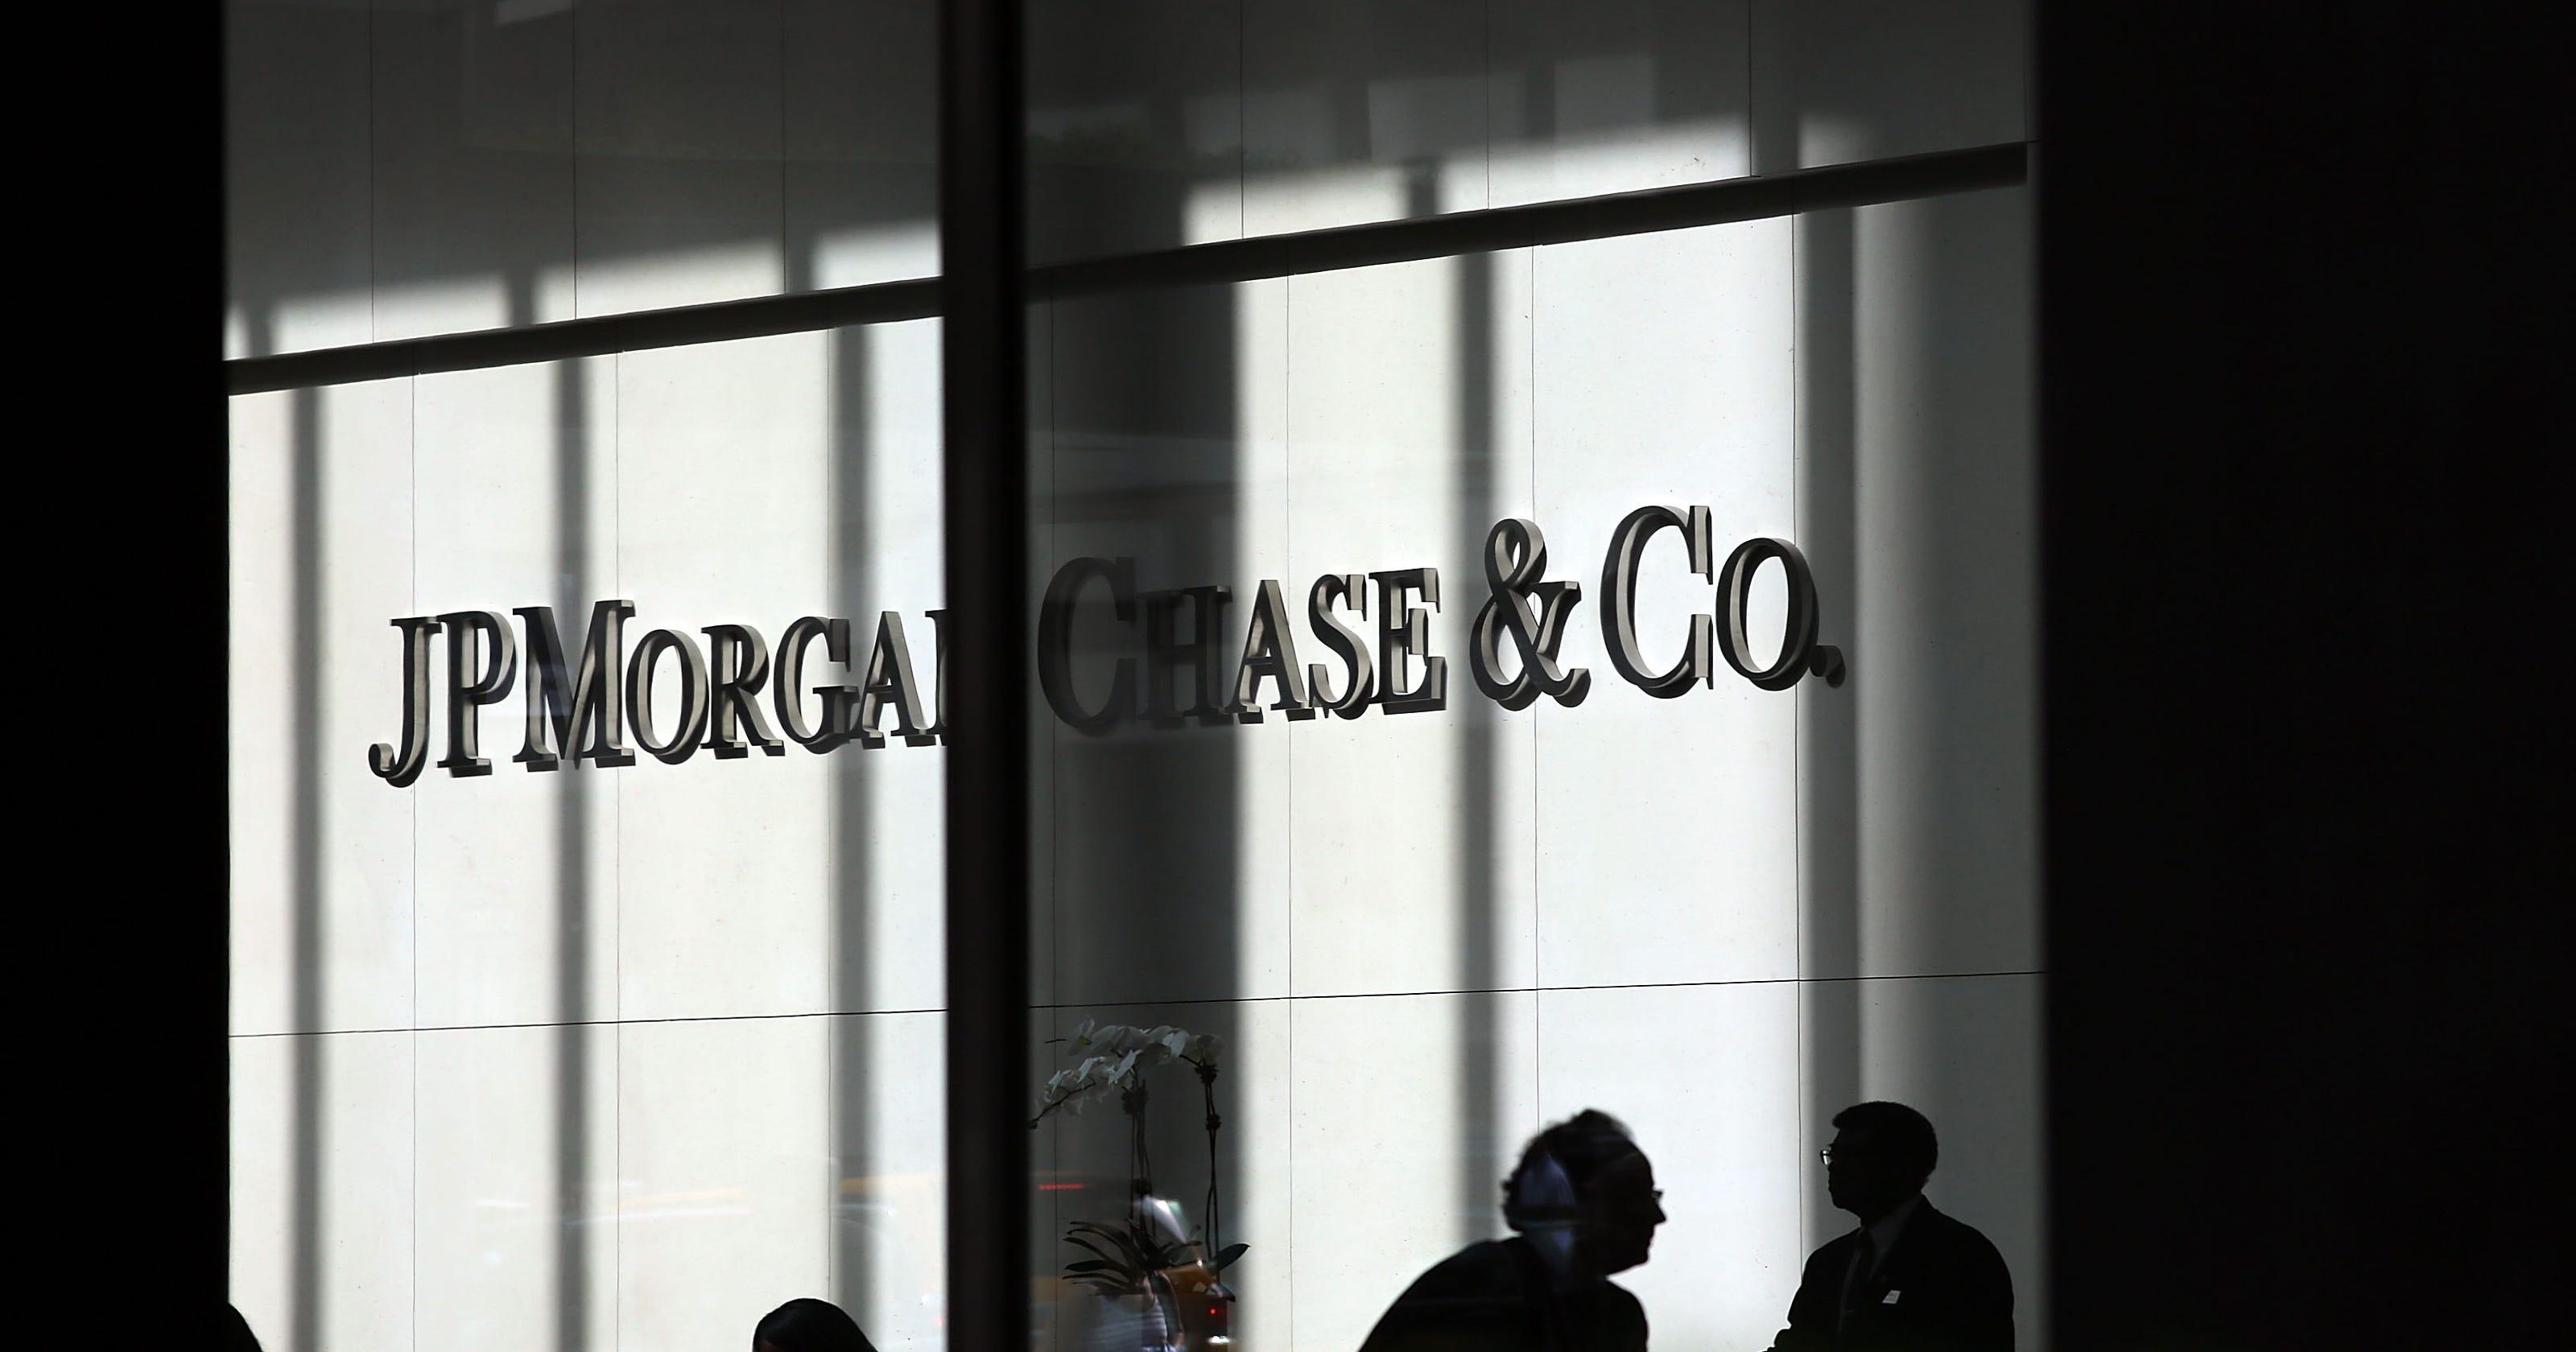 Ex-JPMorgan adviser charged in $20M fraud